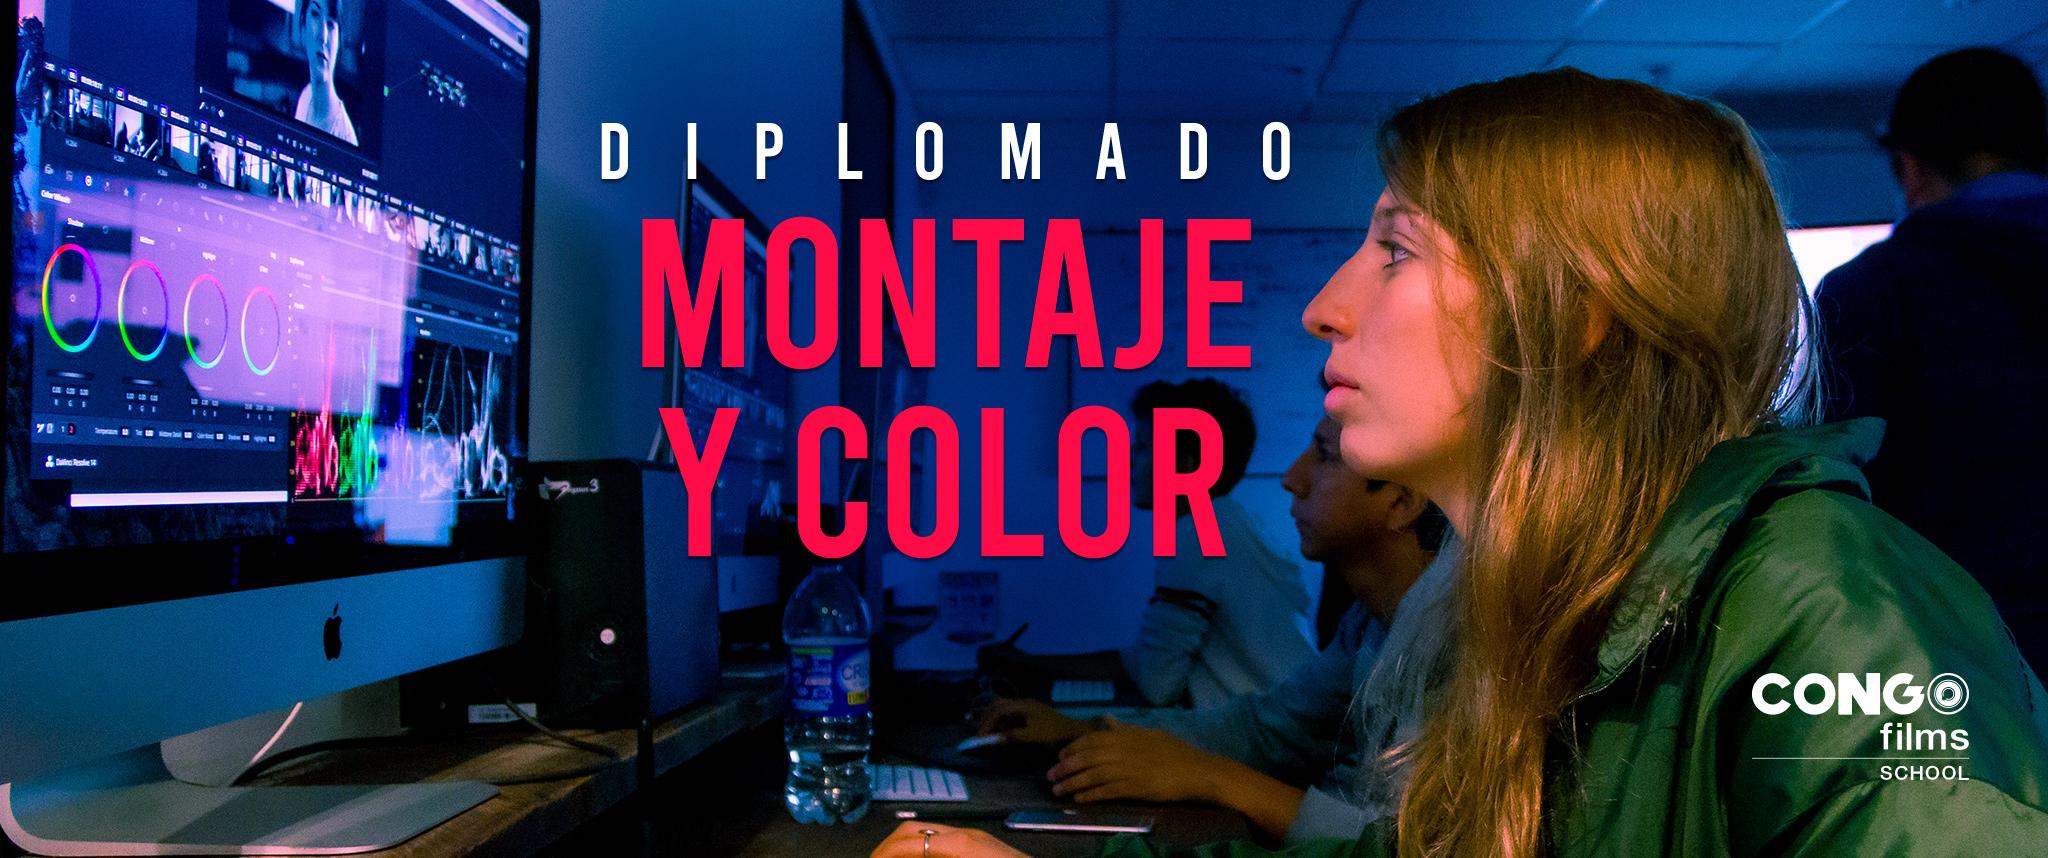 Estudiar Cine Montaje Color Cine Aprender.jpg